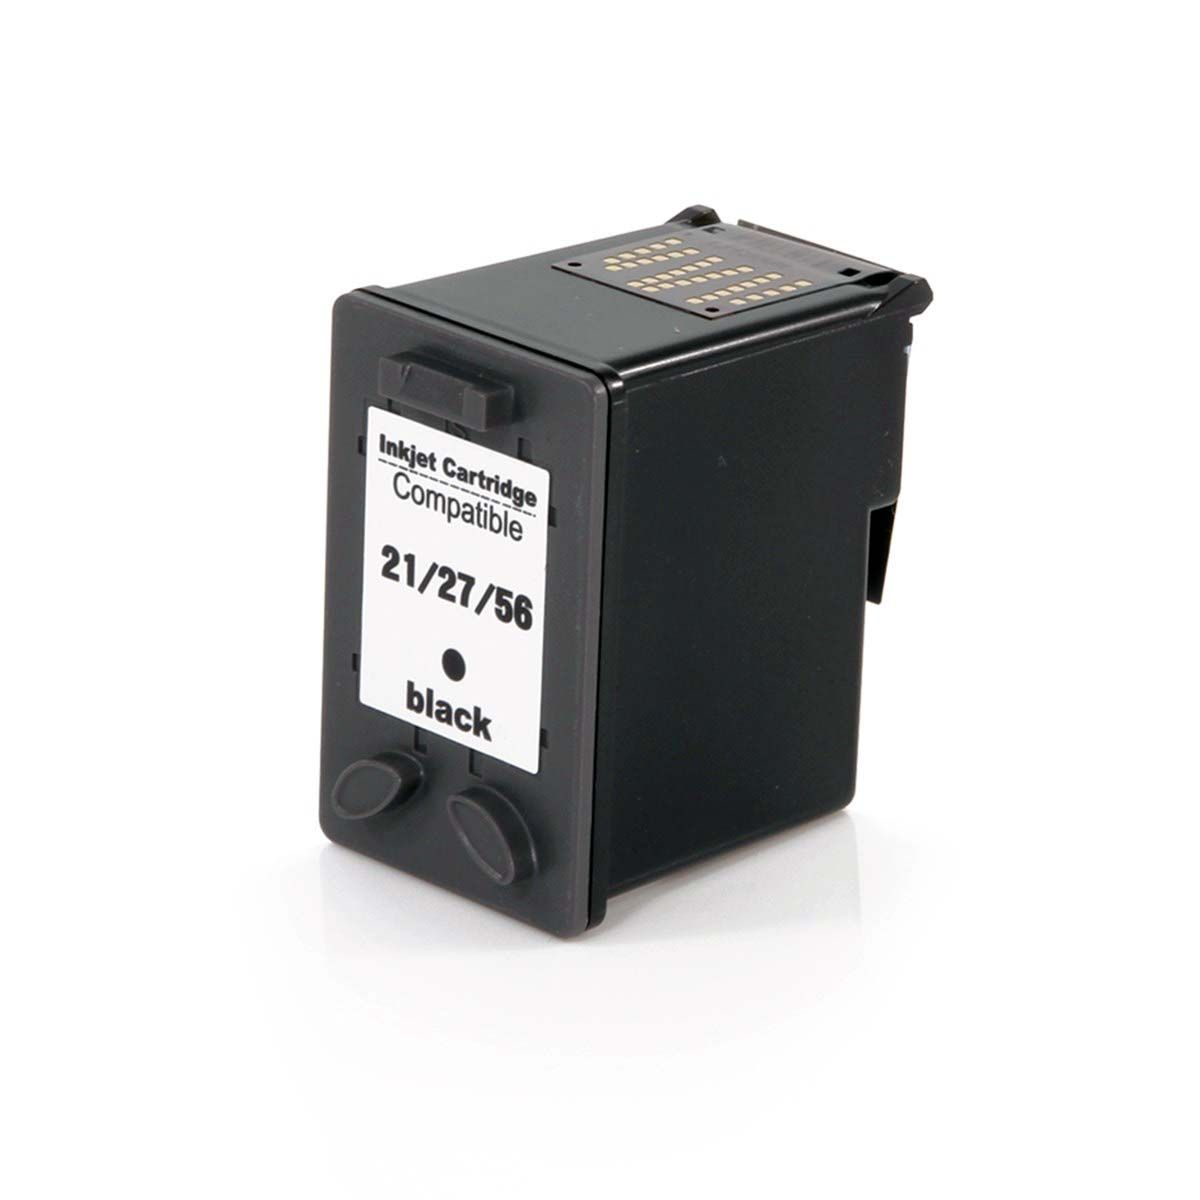 CARTUCHO DE TINTA (C9351AB/C9351AL/C9351A/C9351CB) HP 21/27/56 XL PRETO